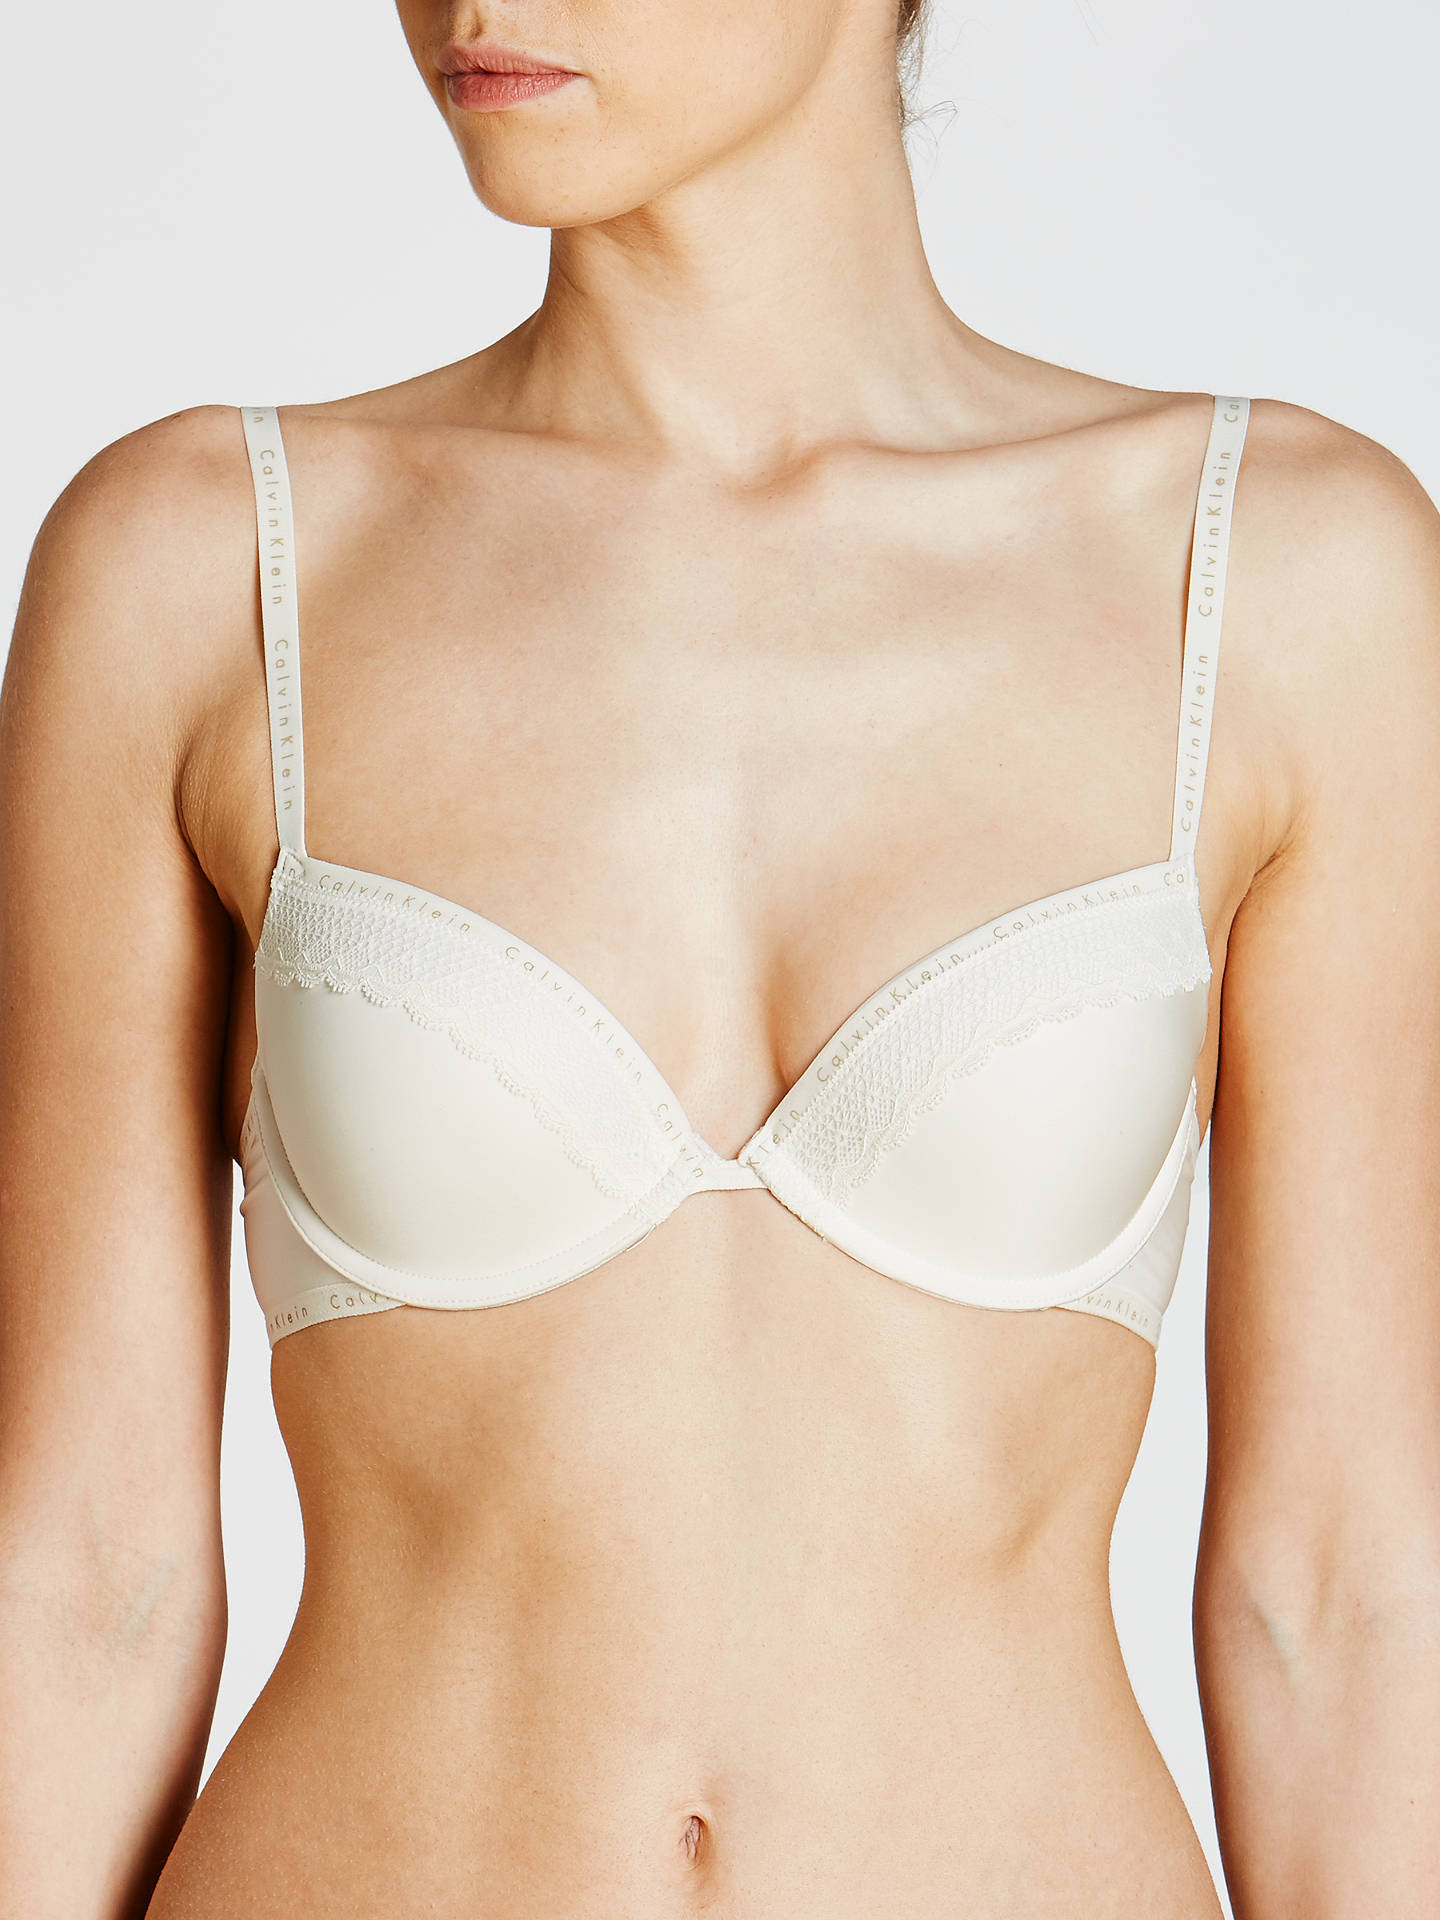 05e3cae83e505d Buy Calvin Klein Underwear Signature Flirty Push Up Bra